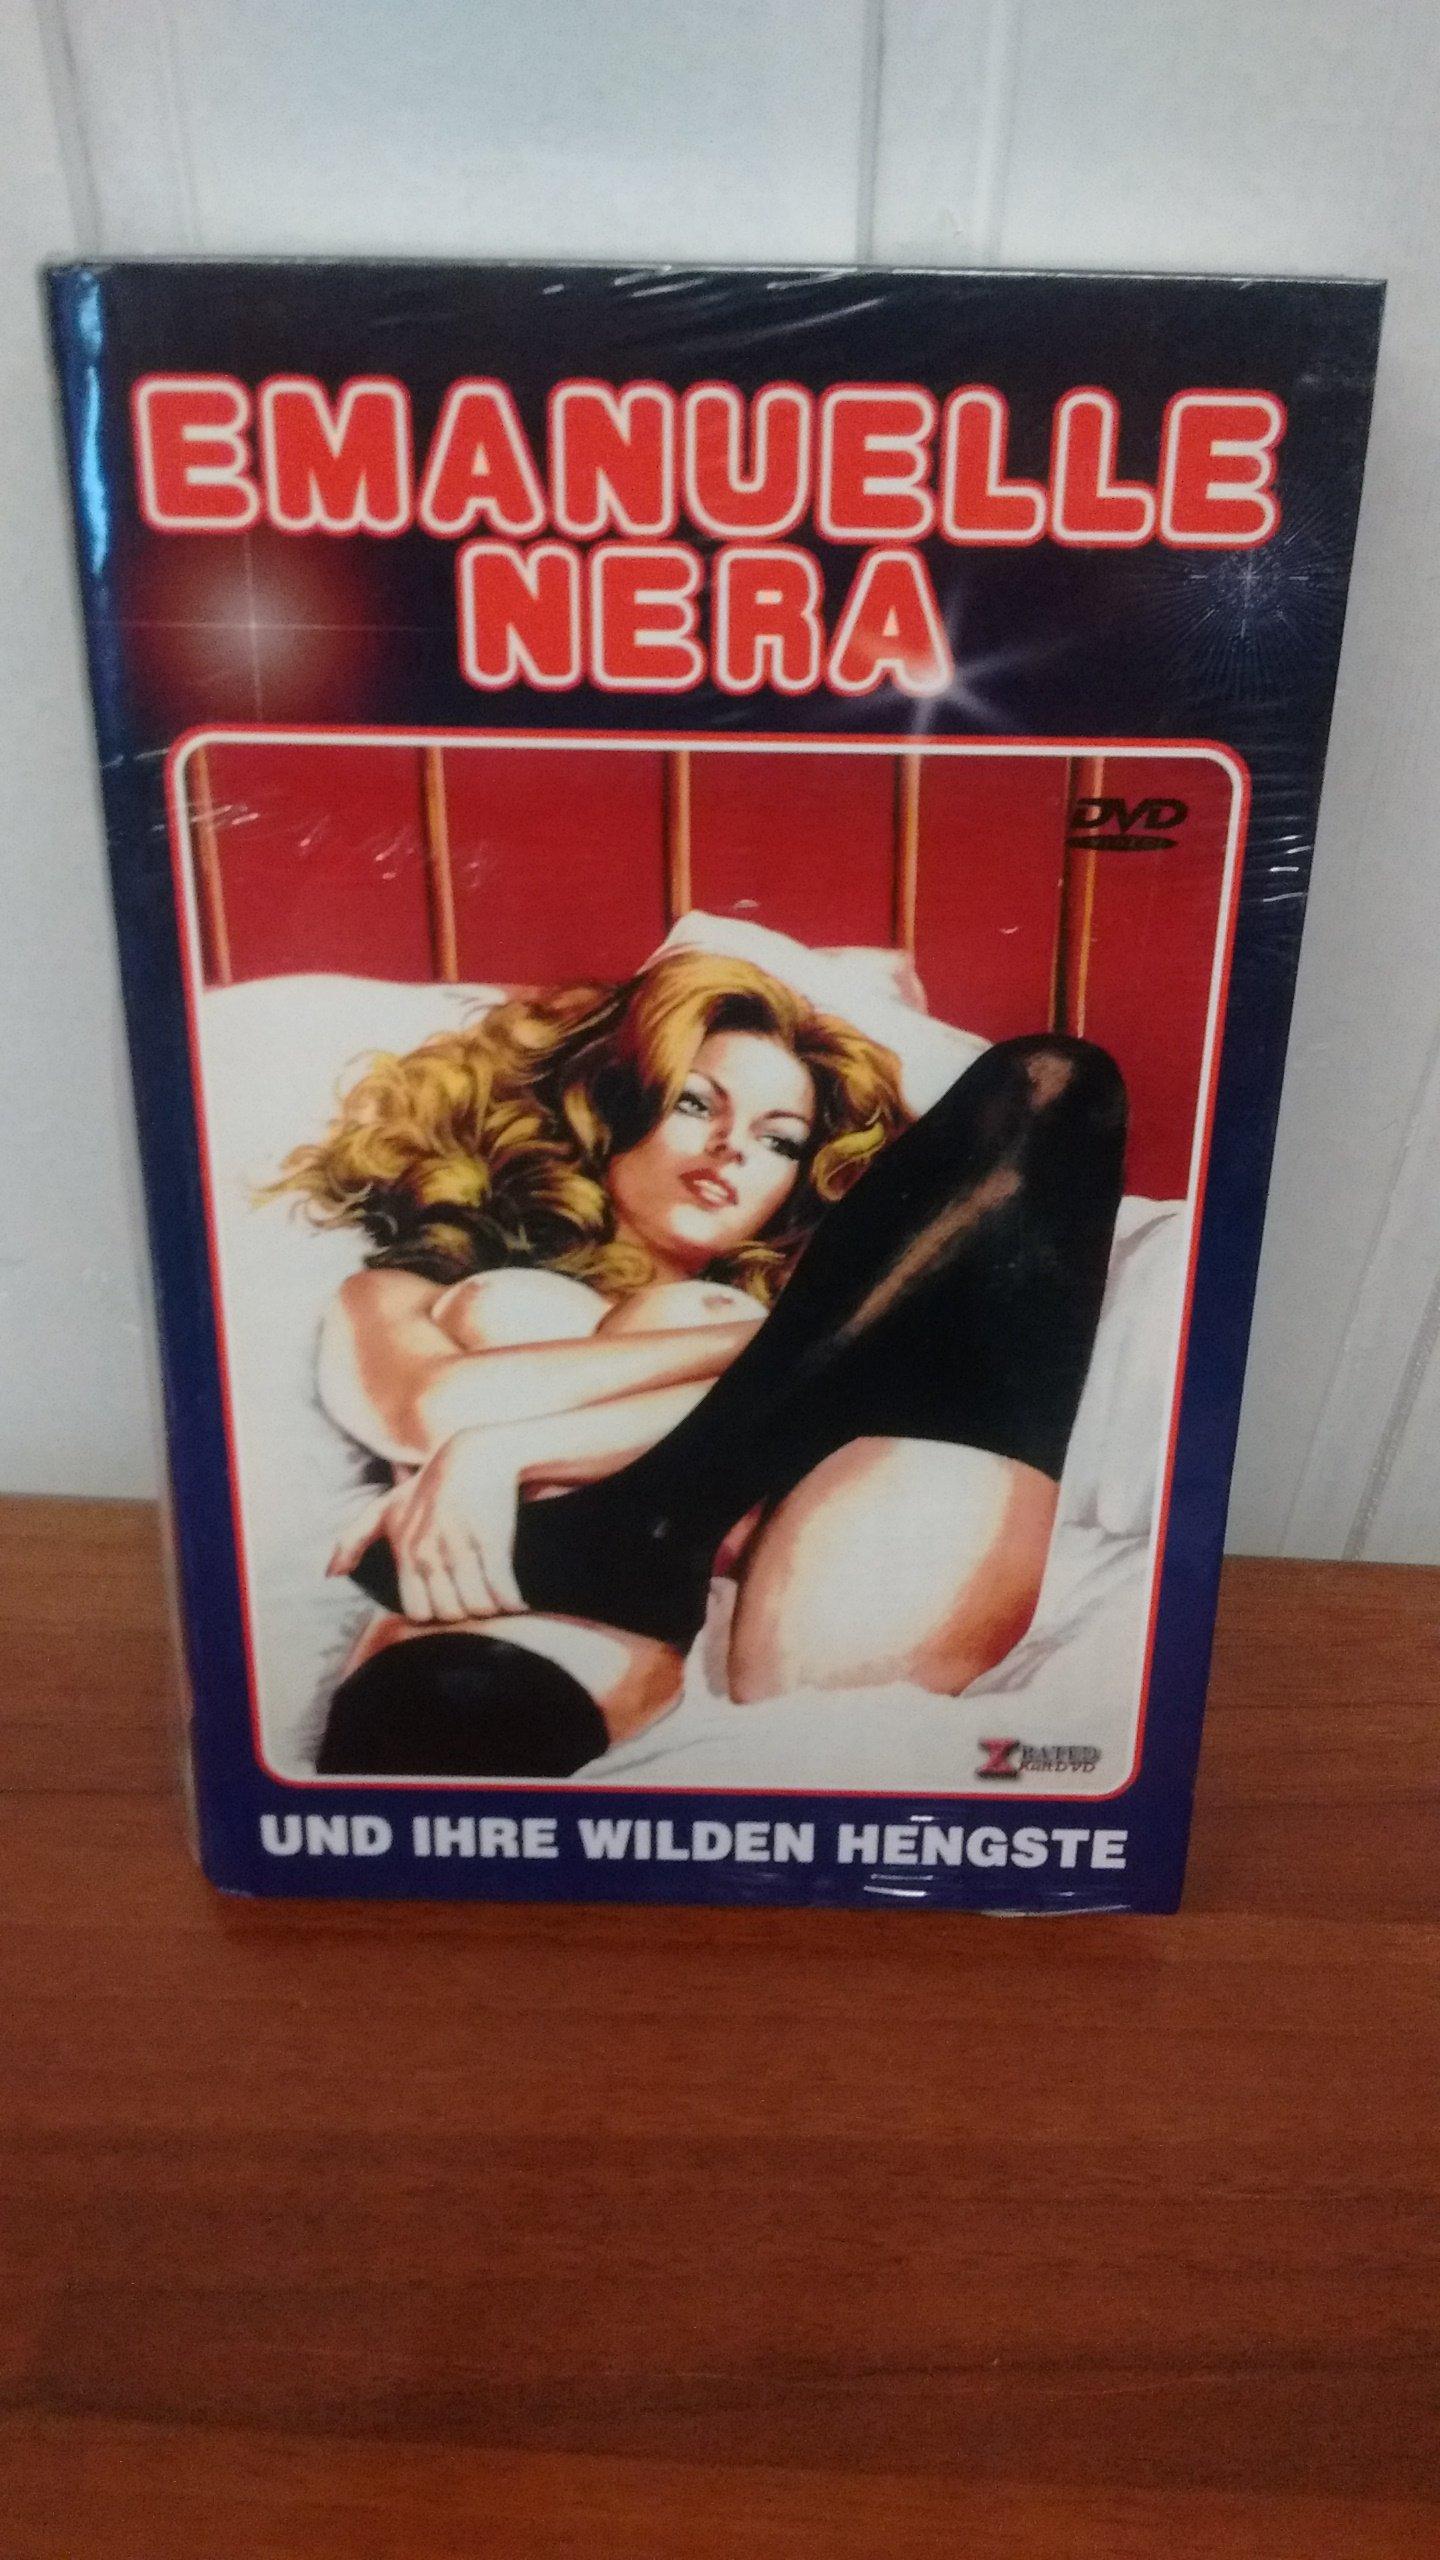 Emanuelle Nera 2 - Big Box X Rated - UNCUT Audio Italiano